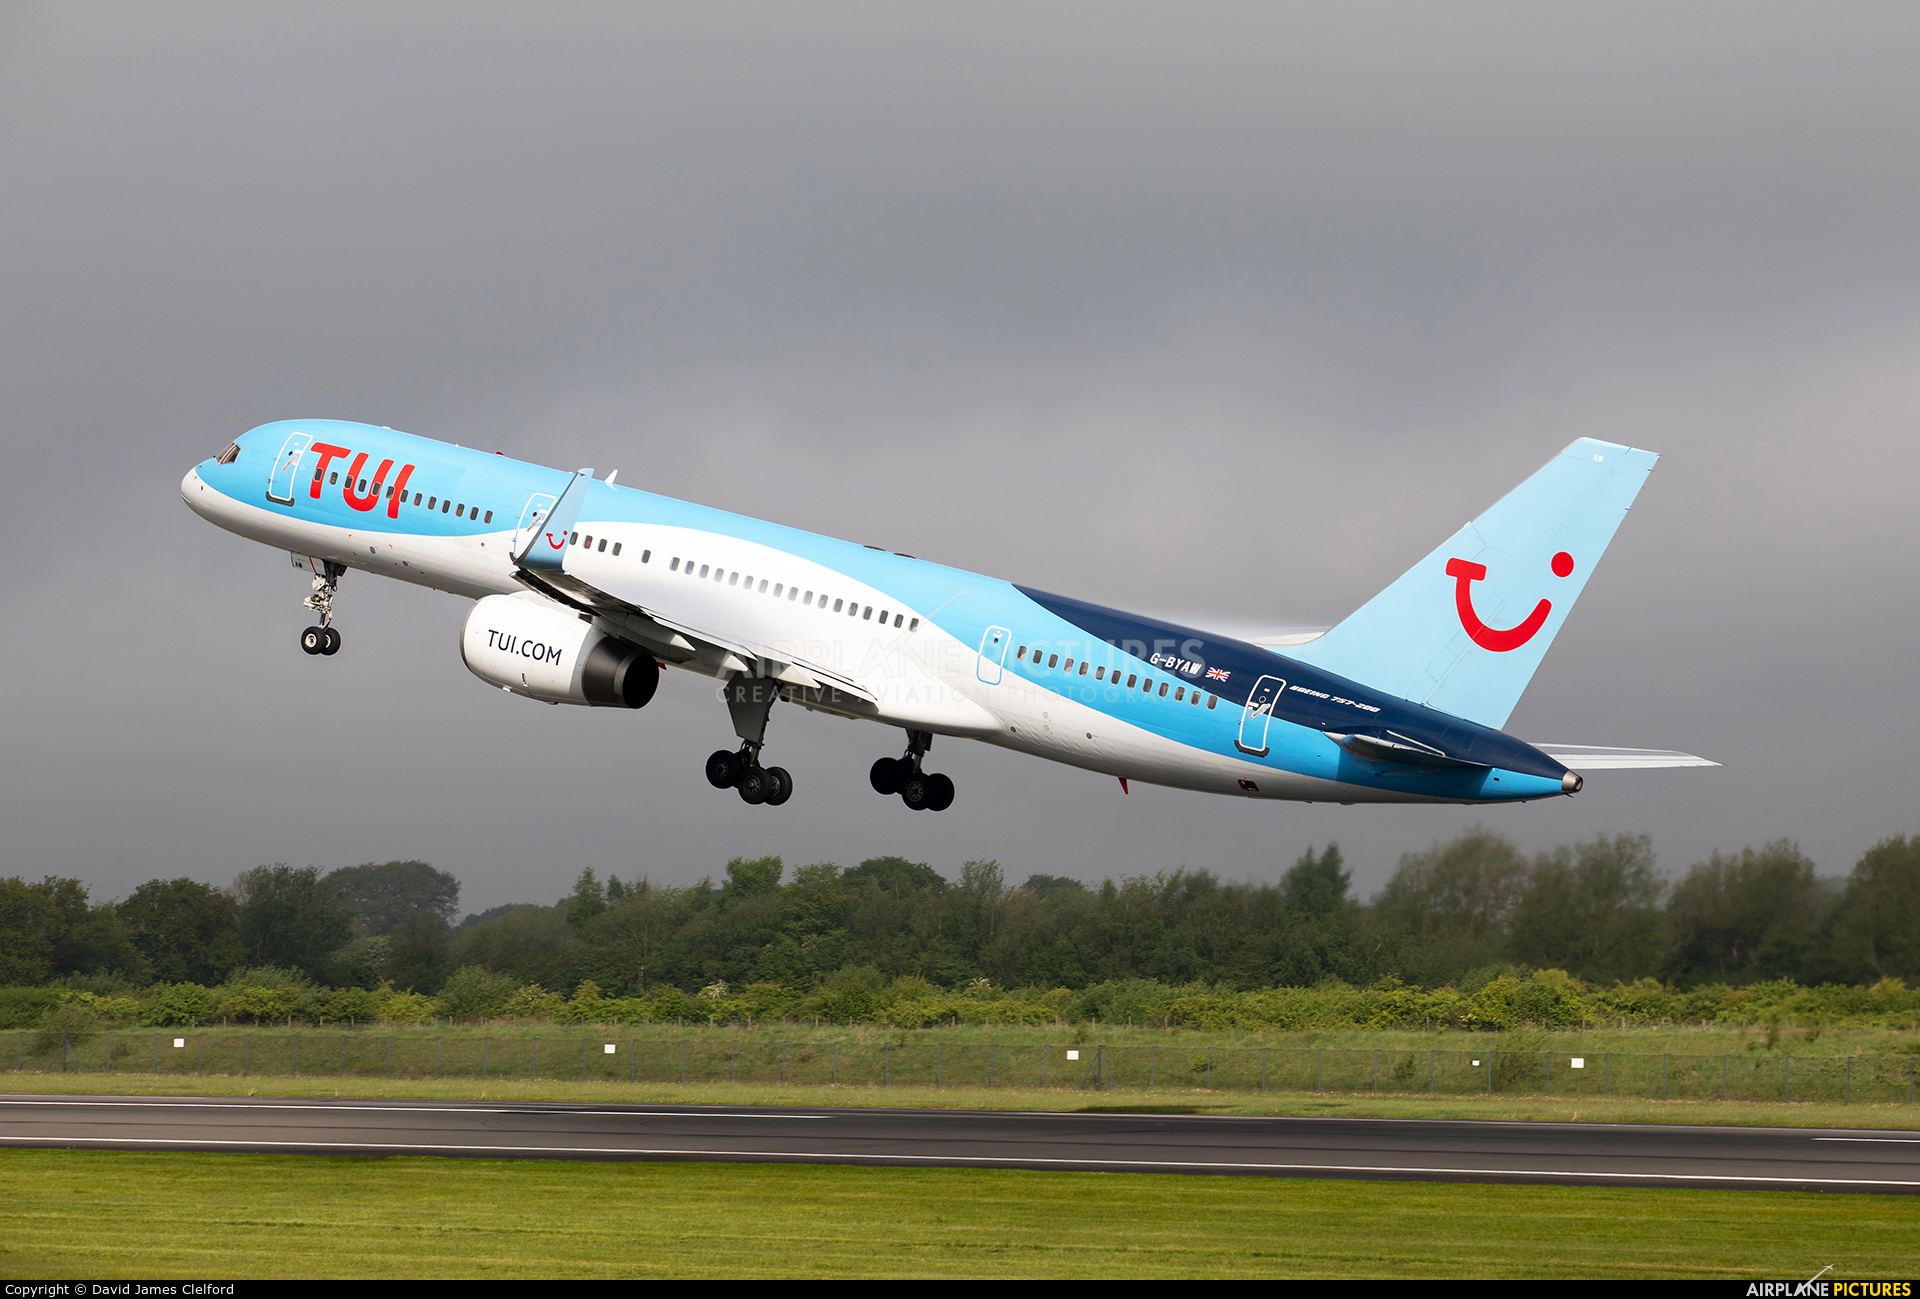 TUI Airways G-BYAW aircraft at Manchester